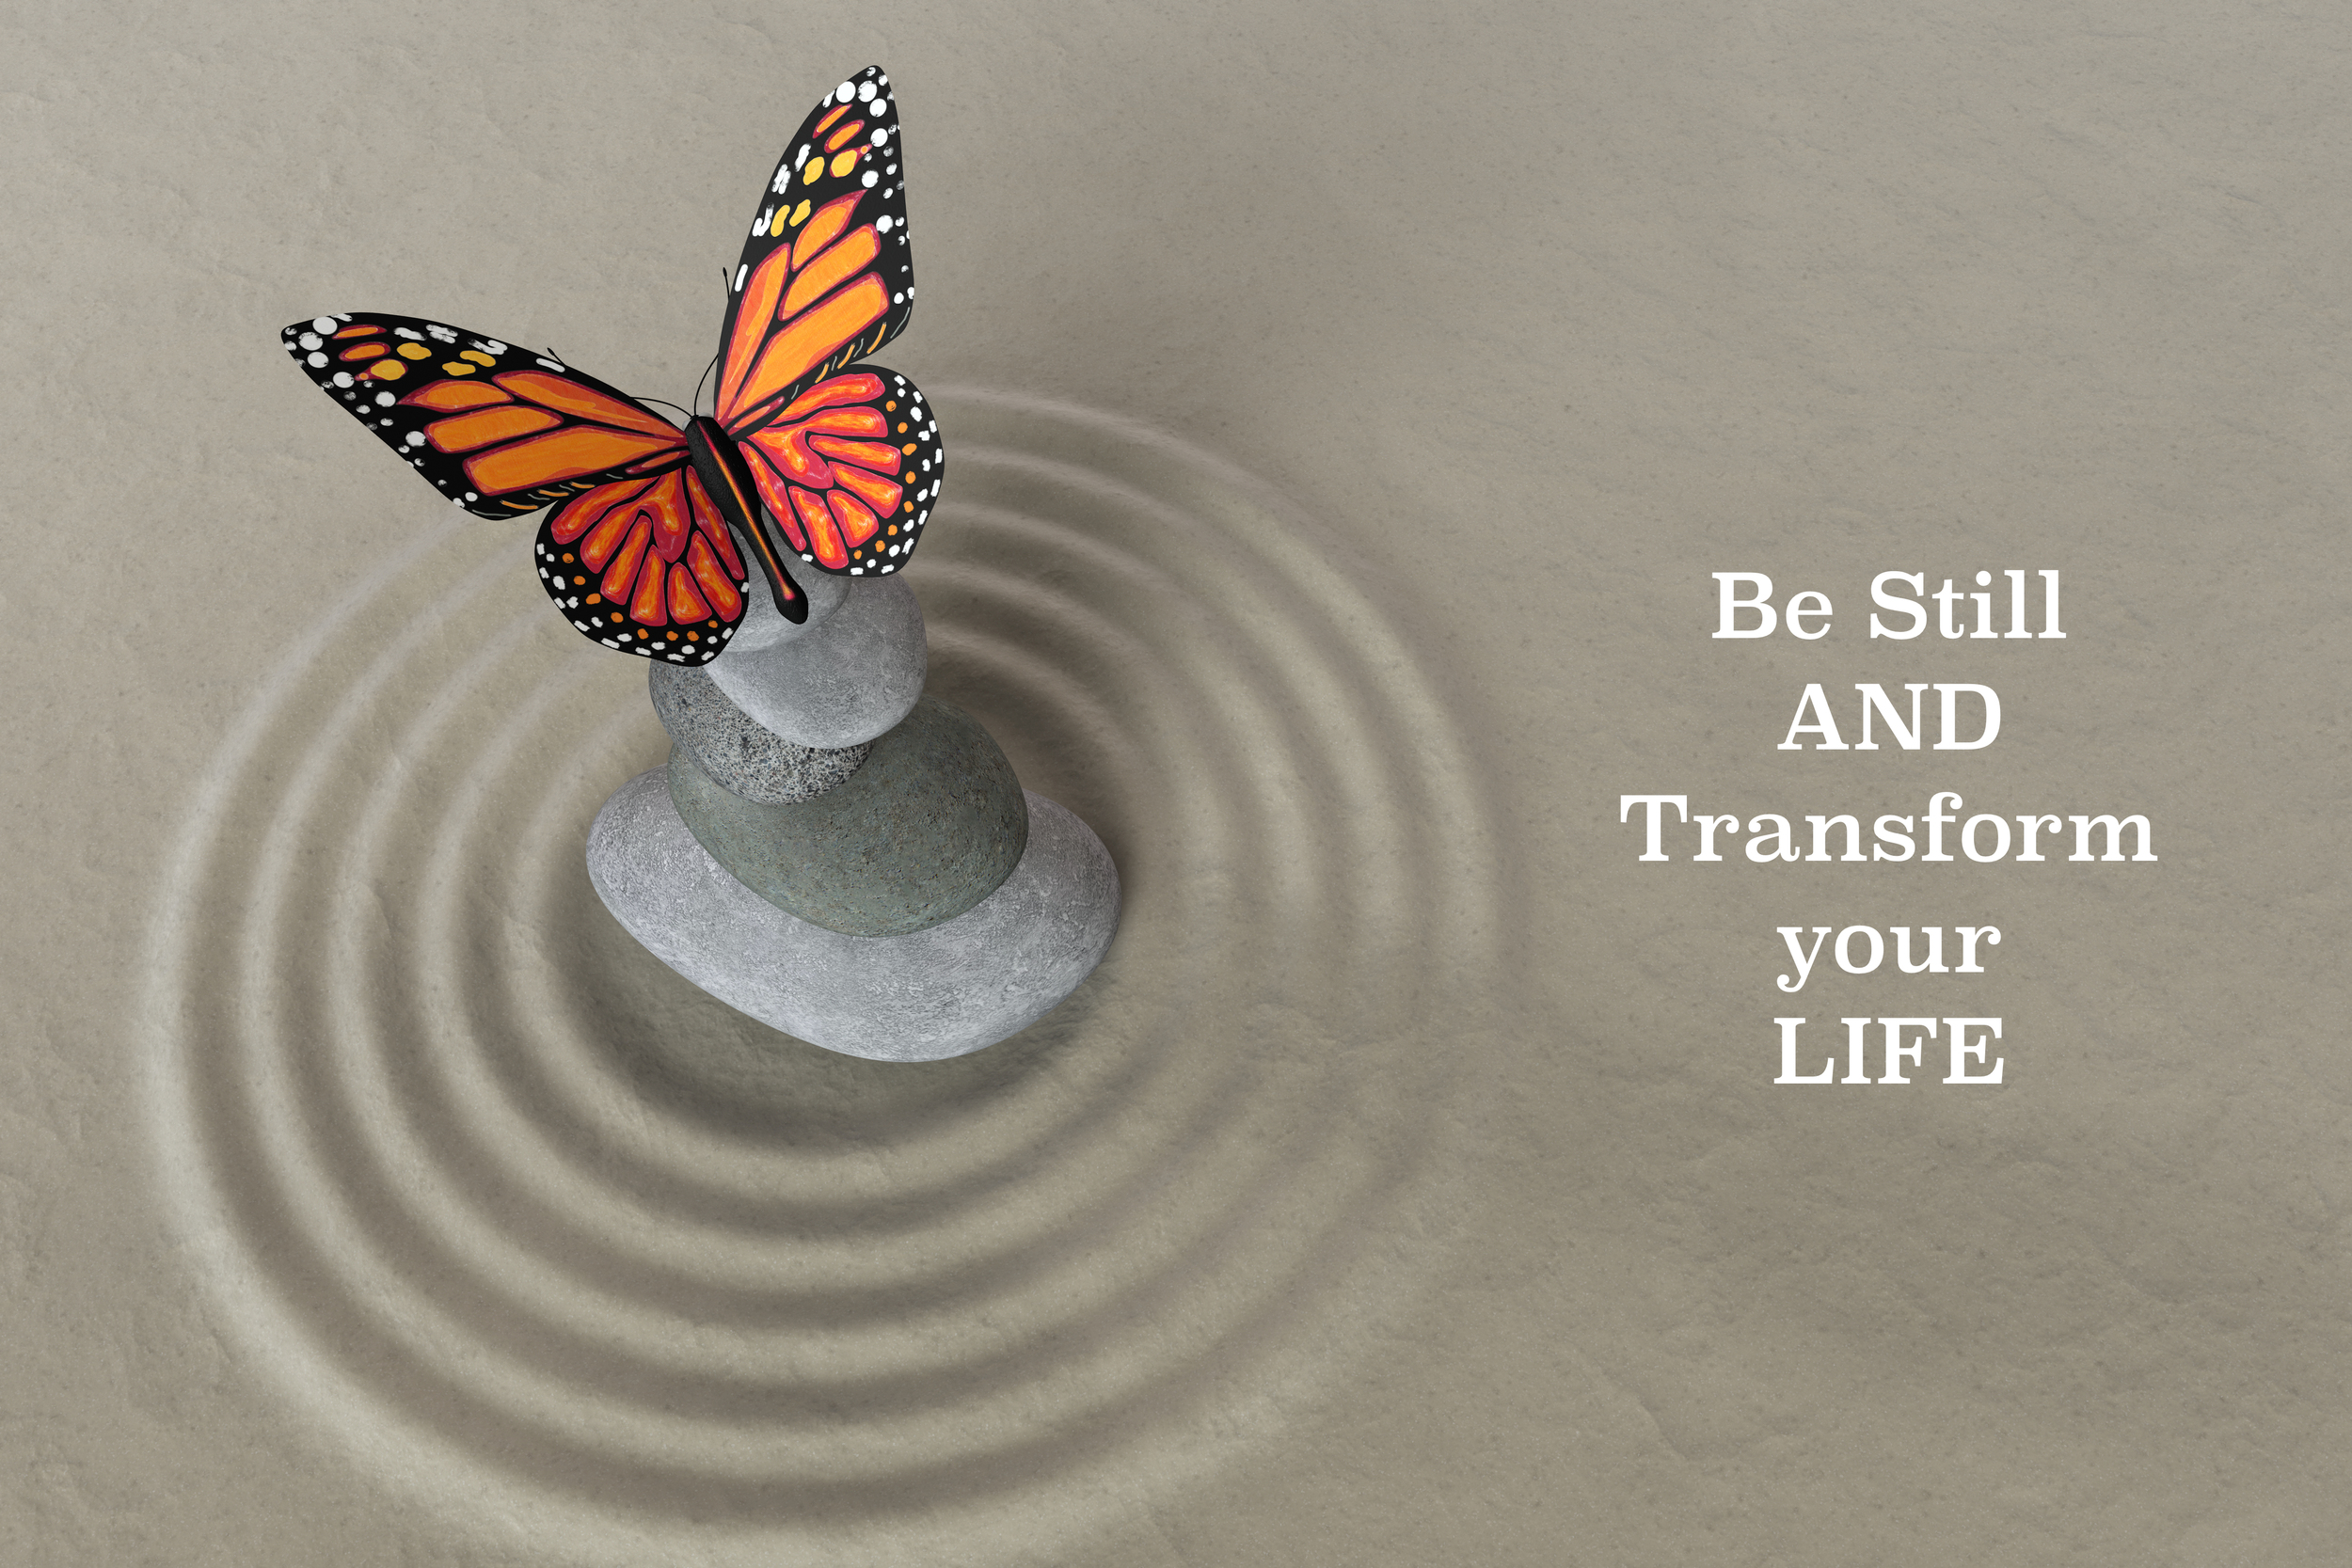 bigstock-Zen-Garden-Meditation-Stone-Wi-46827835.jpg